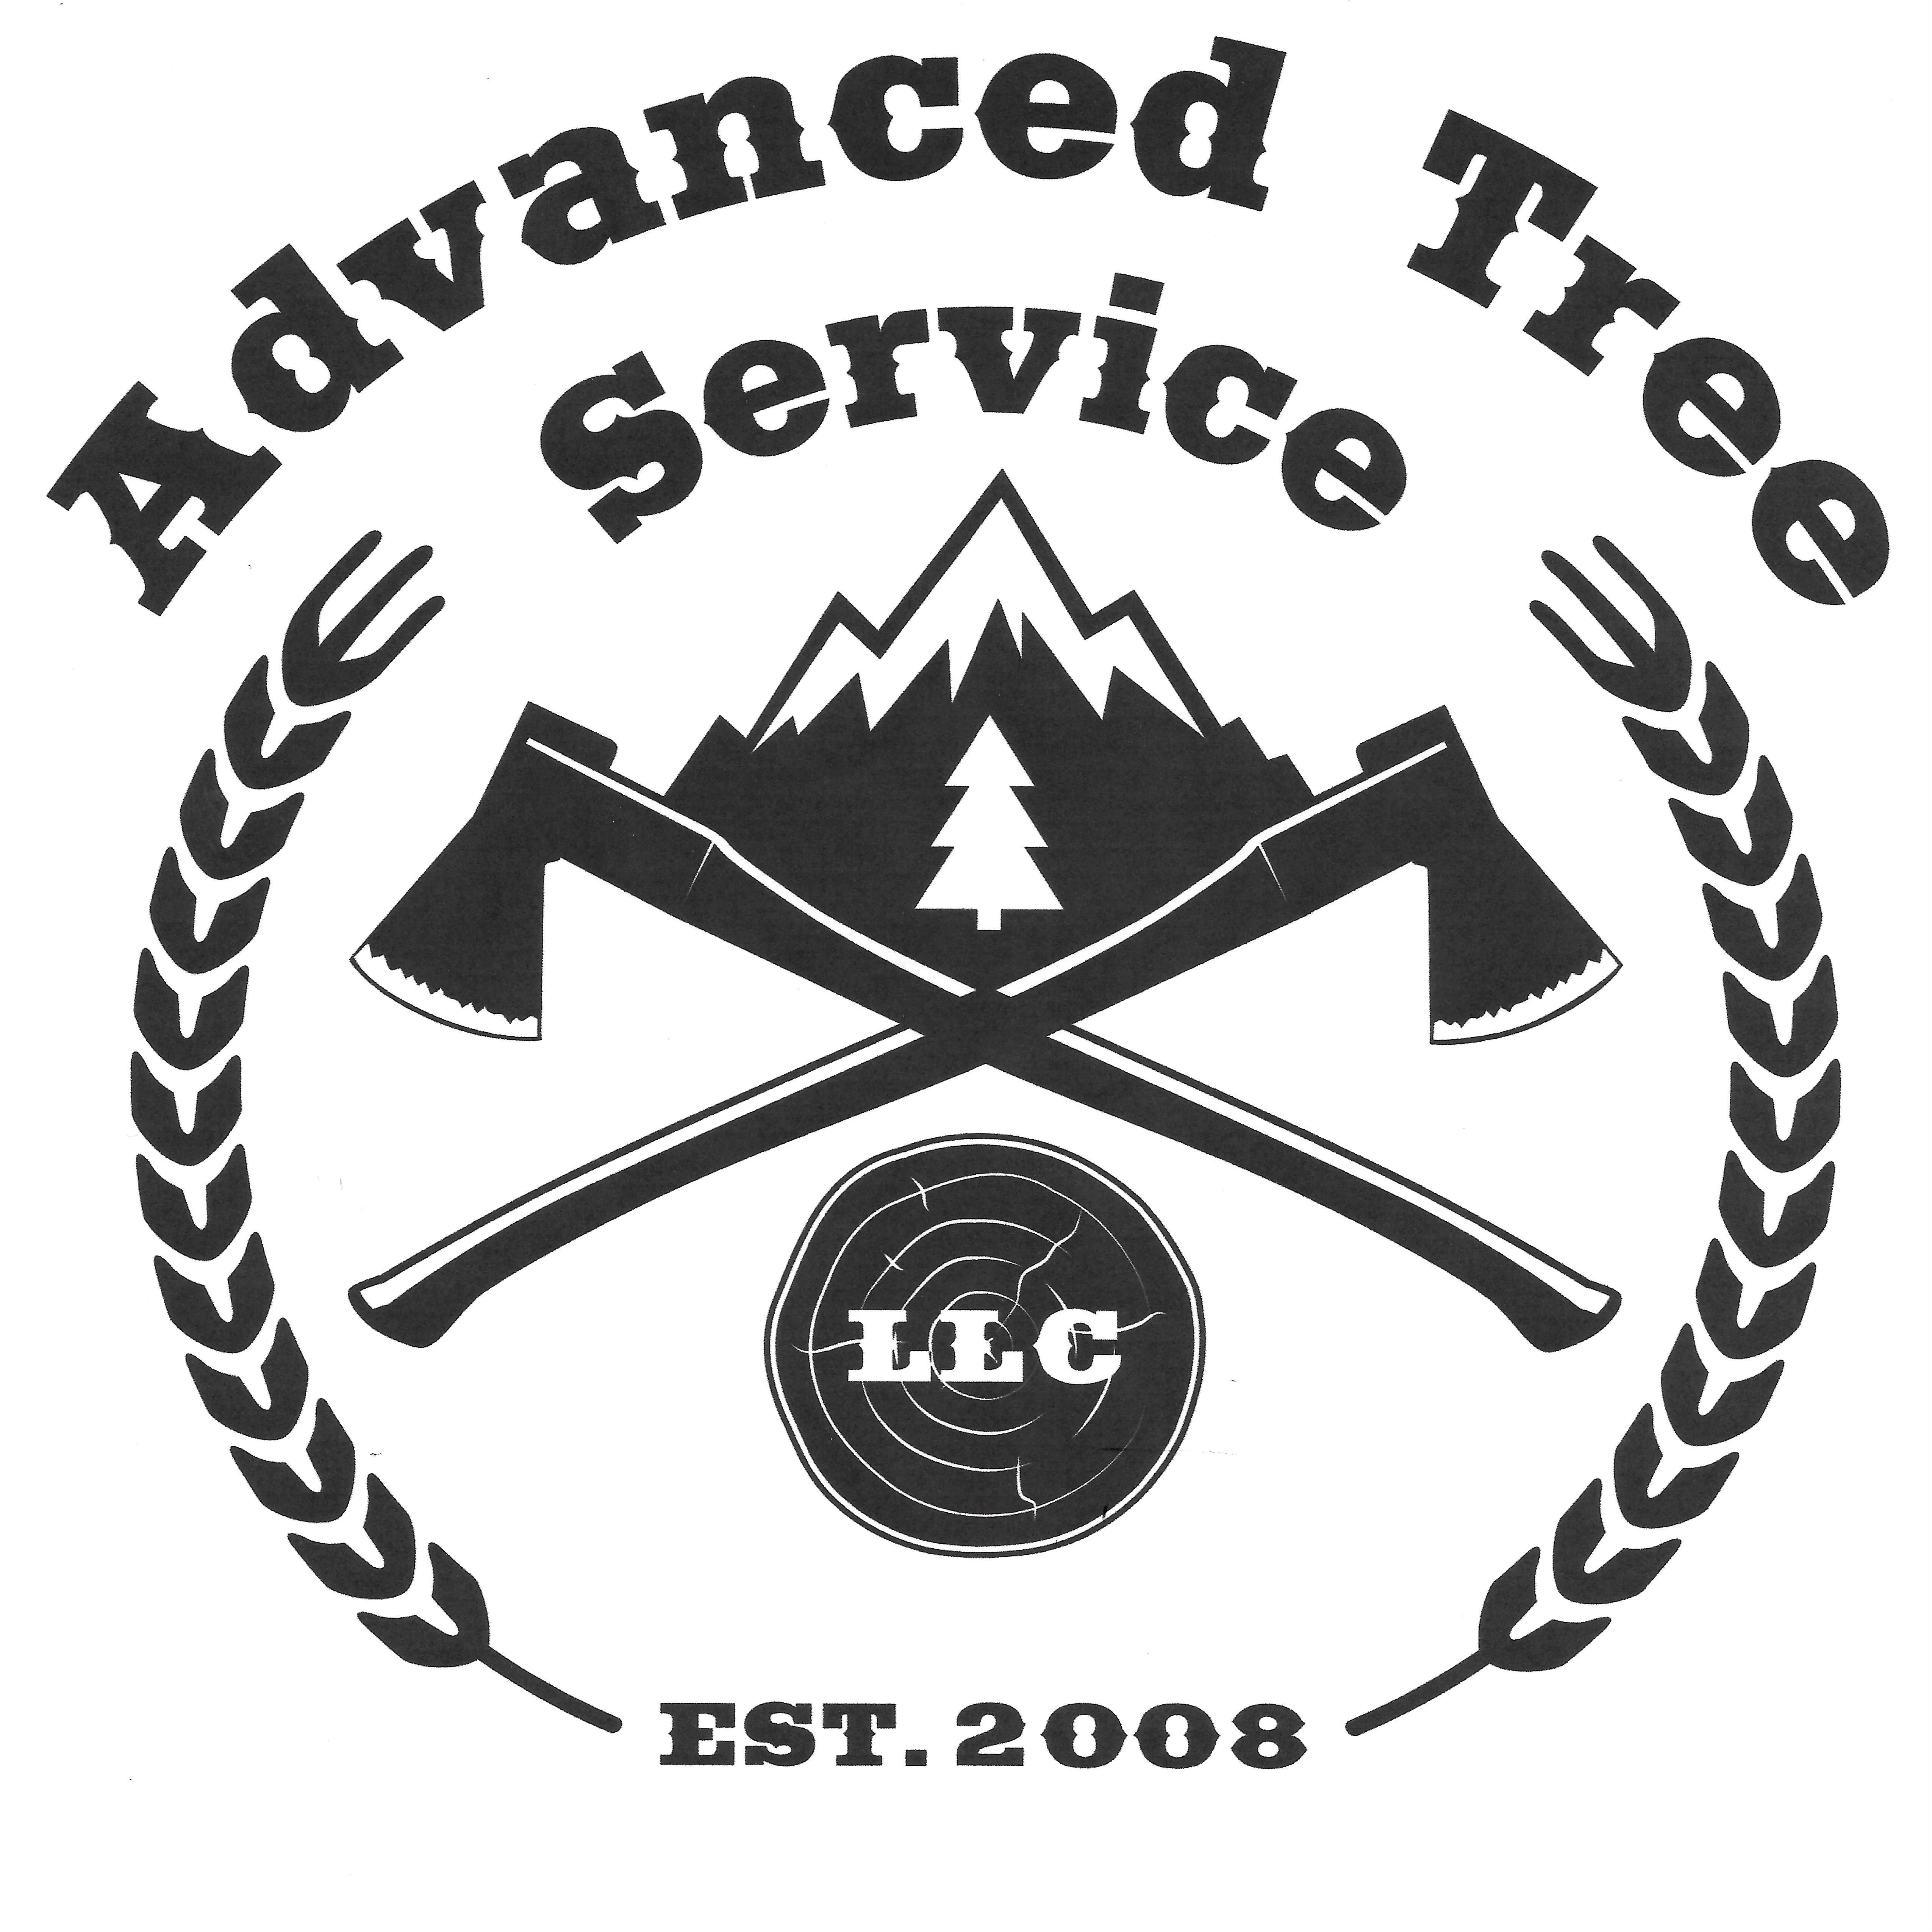 Tree Service in CO Colorado Springs 80911 Advanced Tree Service LLC 5215 Bradley Cir  (719)464-4625